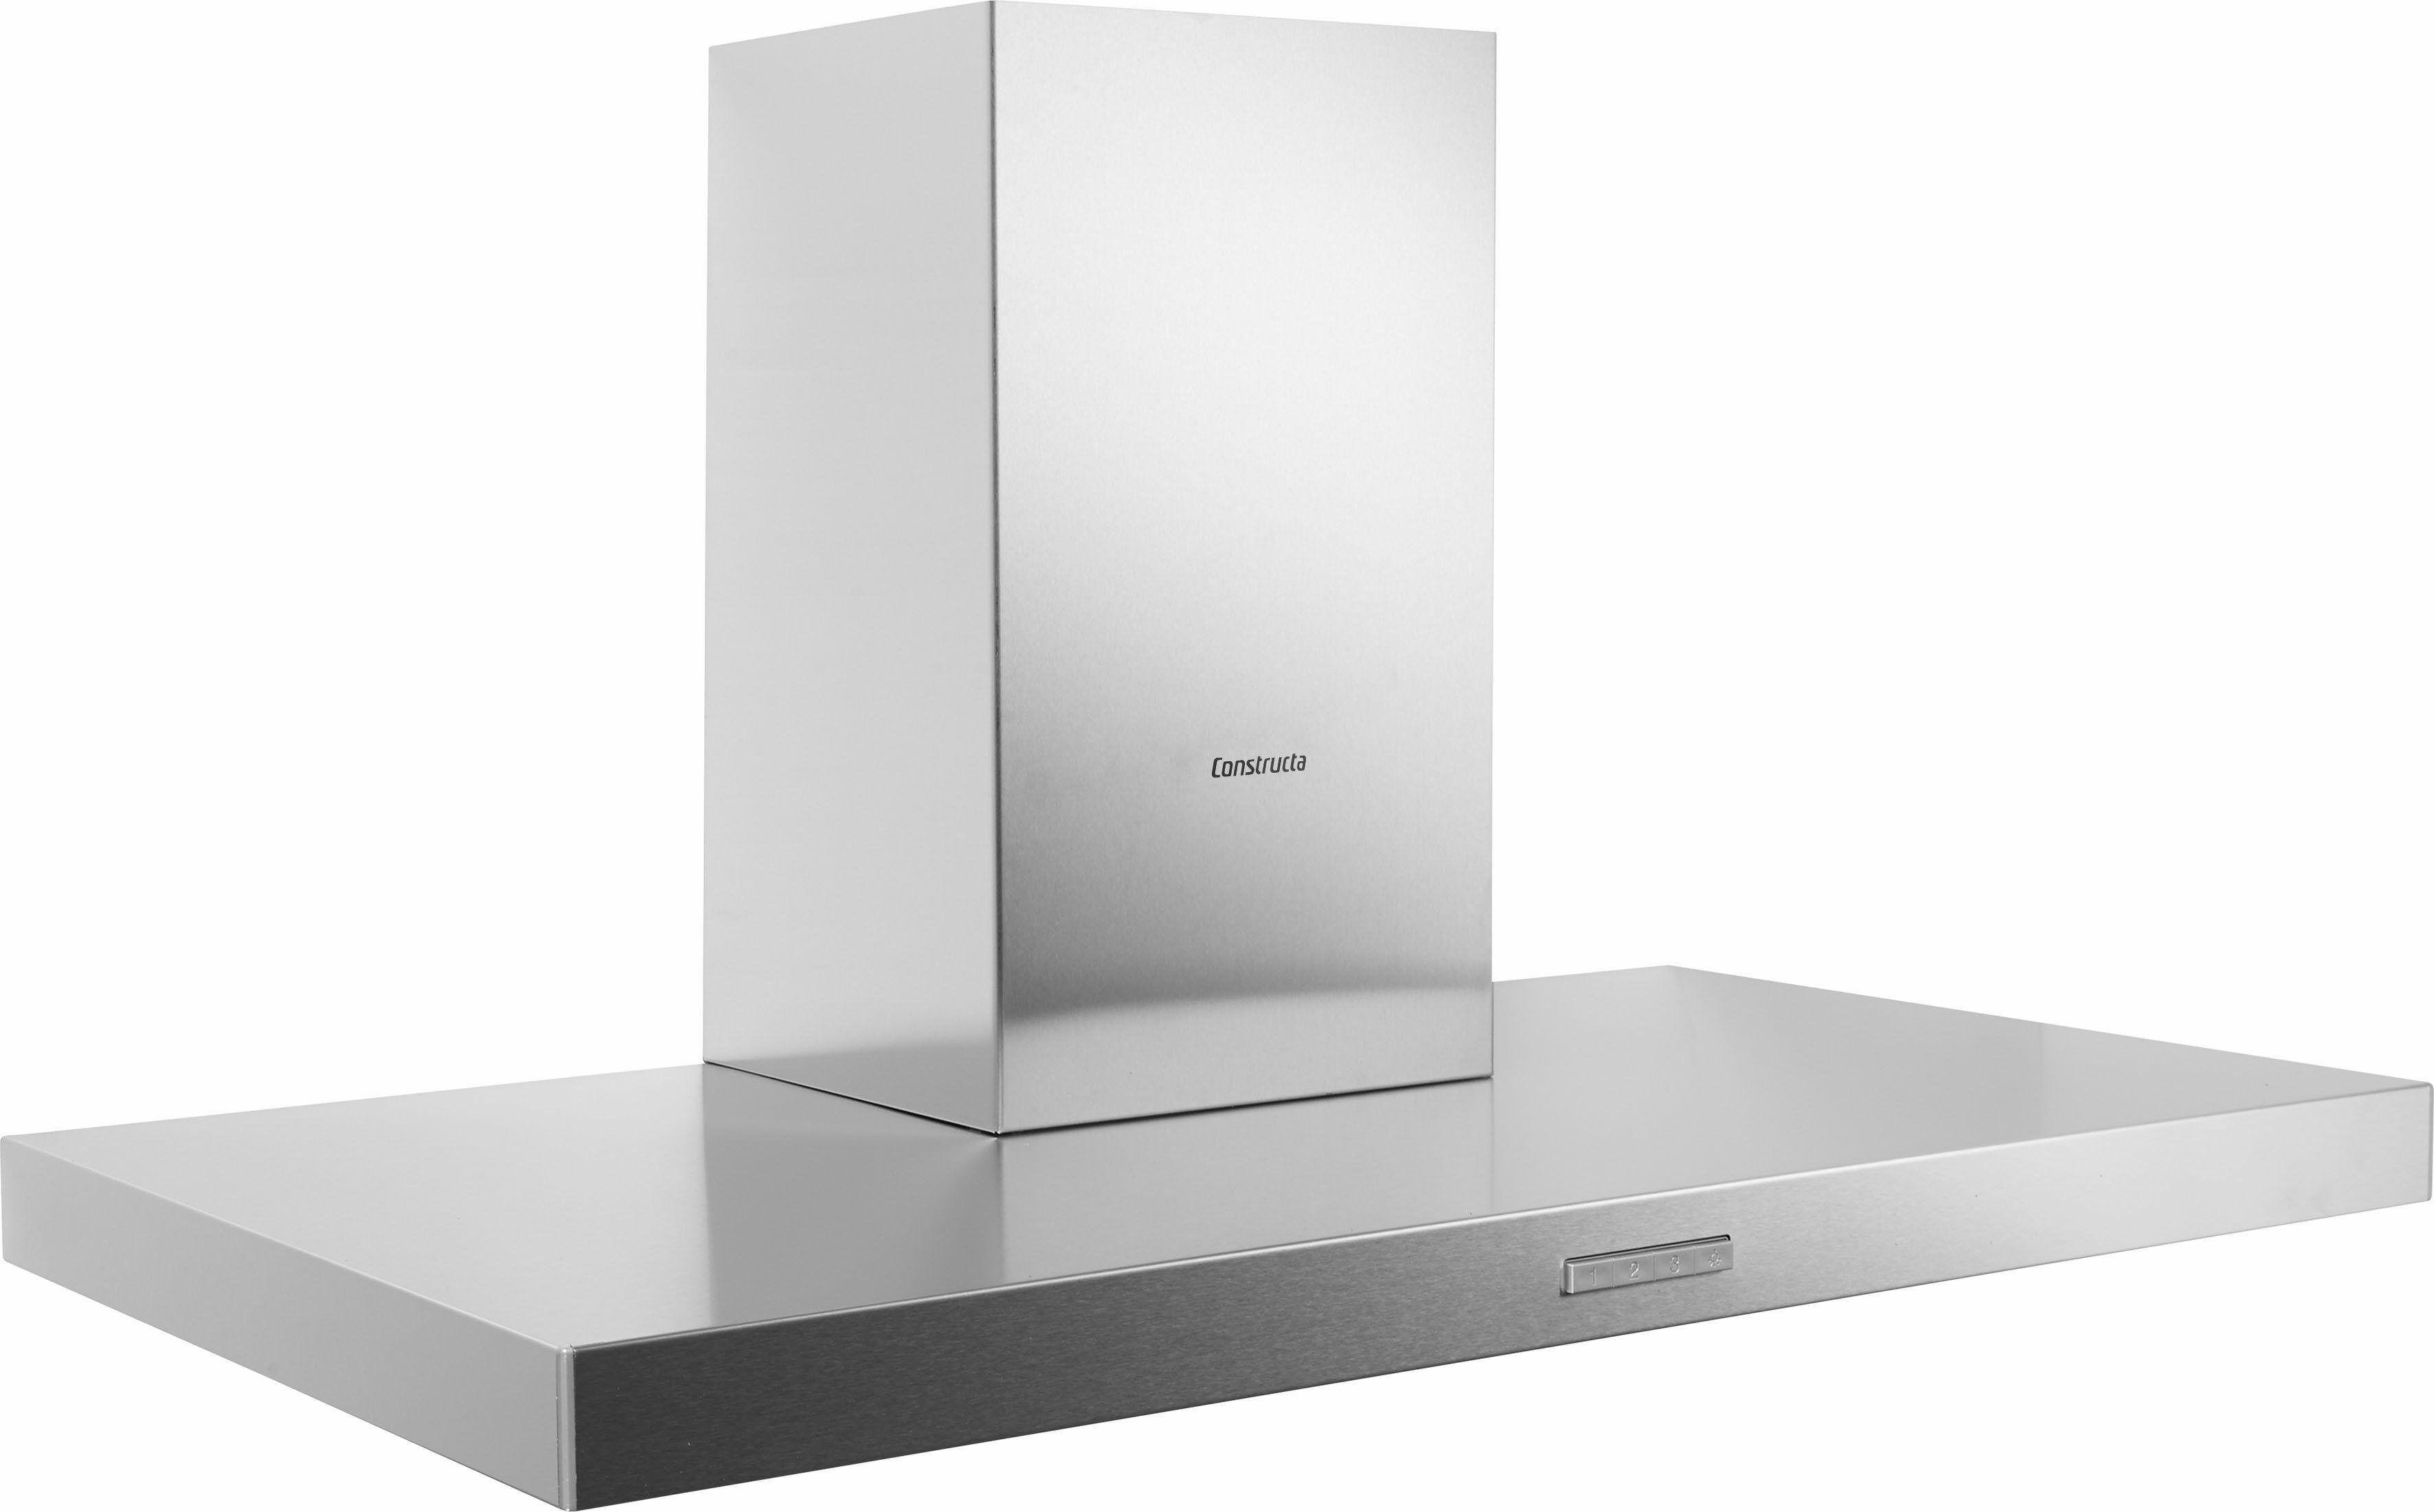 Constructa Wandhaube CD639650, Energieeffizienzklasse D